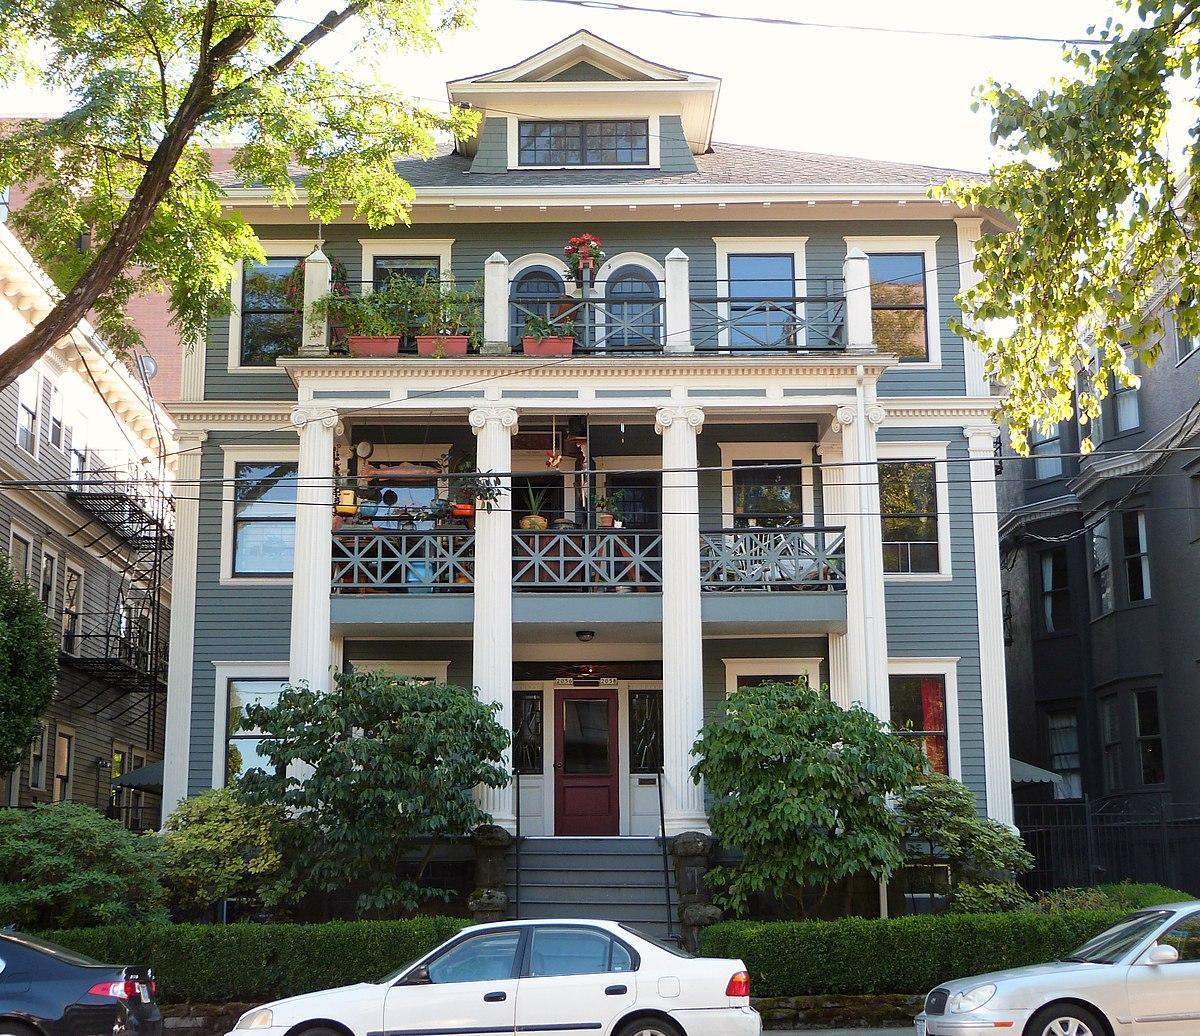 Dayton Apartment Building - Wikipedia